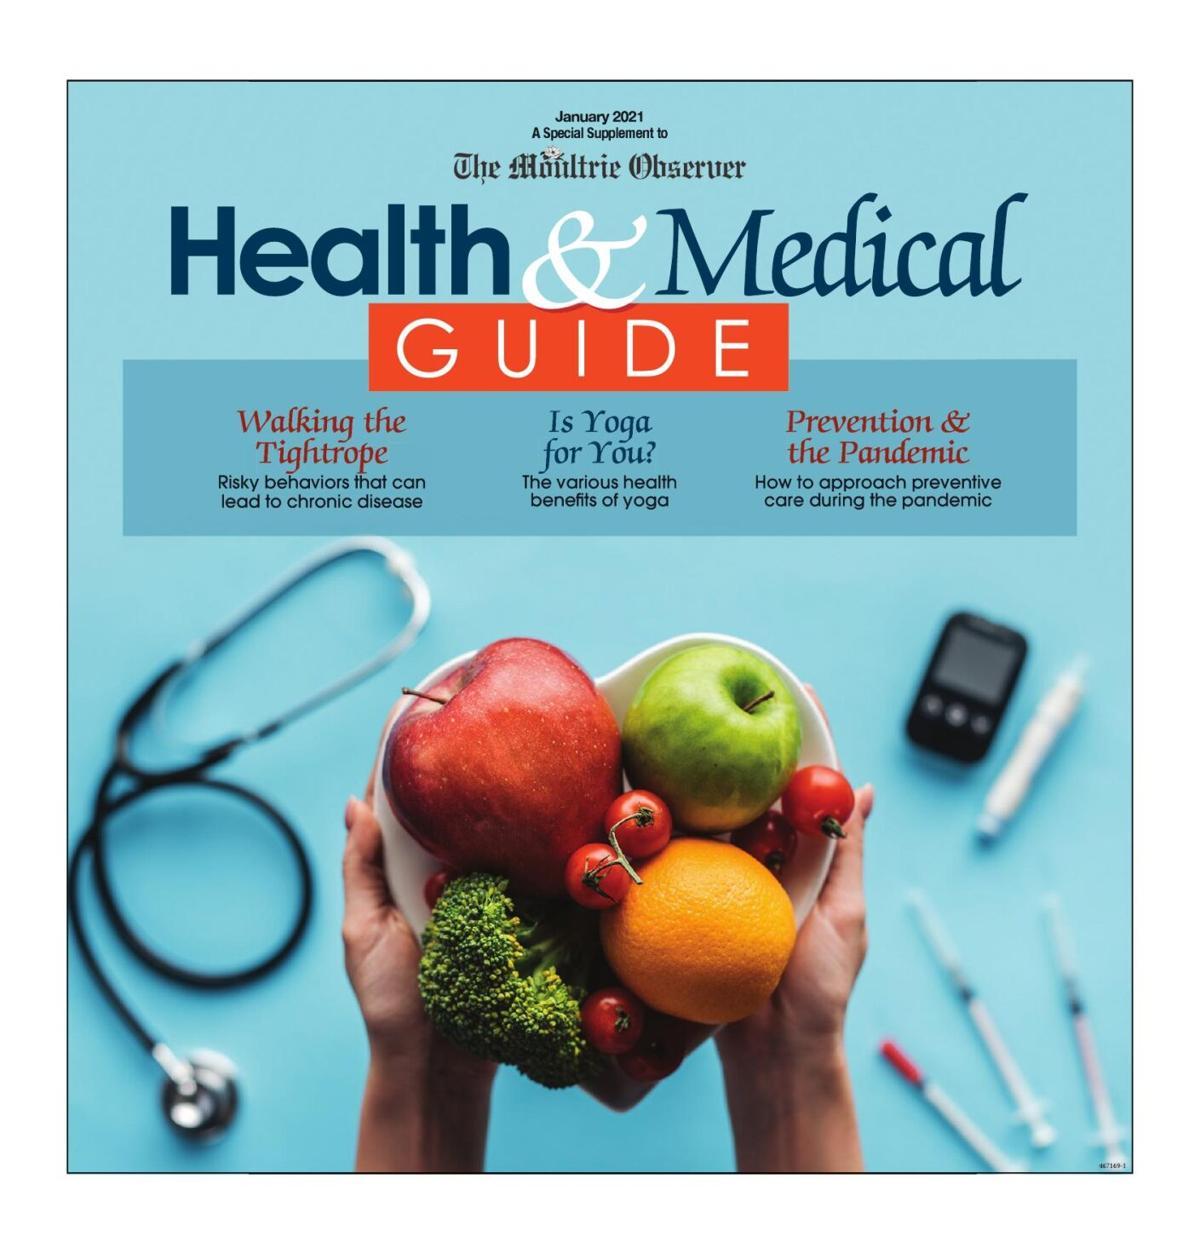 Health & Medical Guide